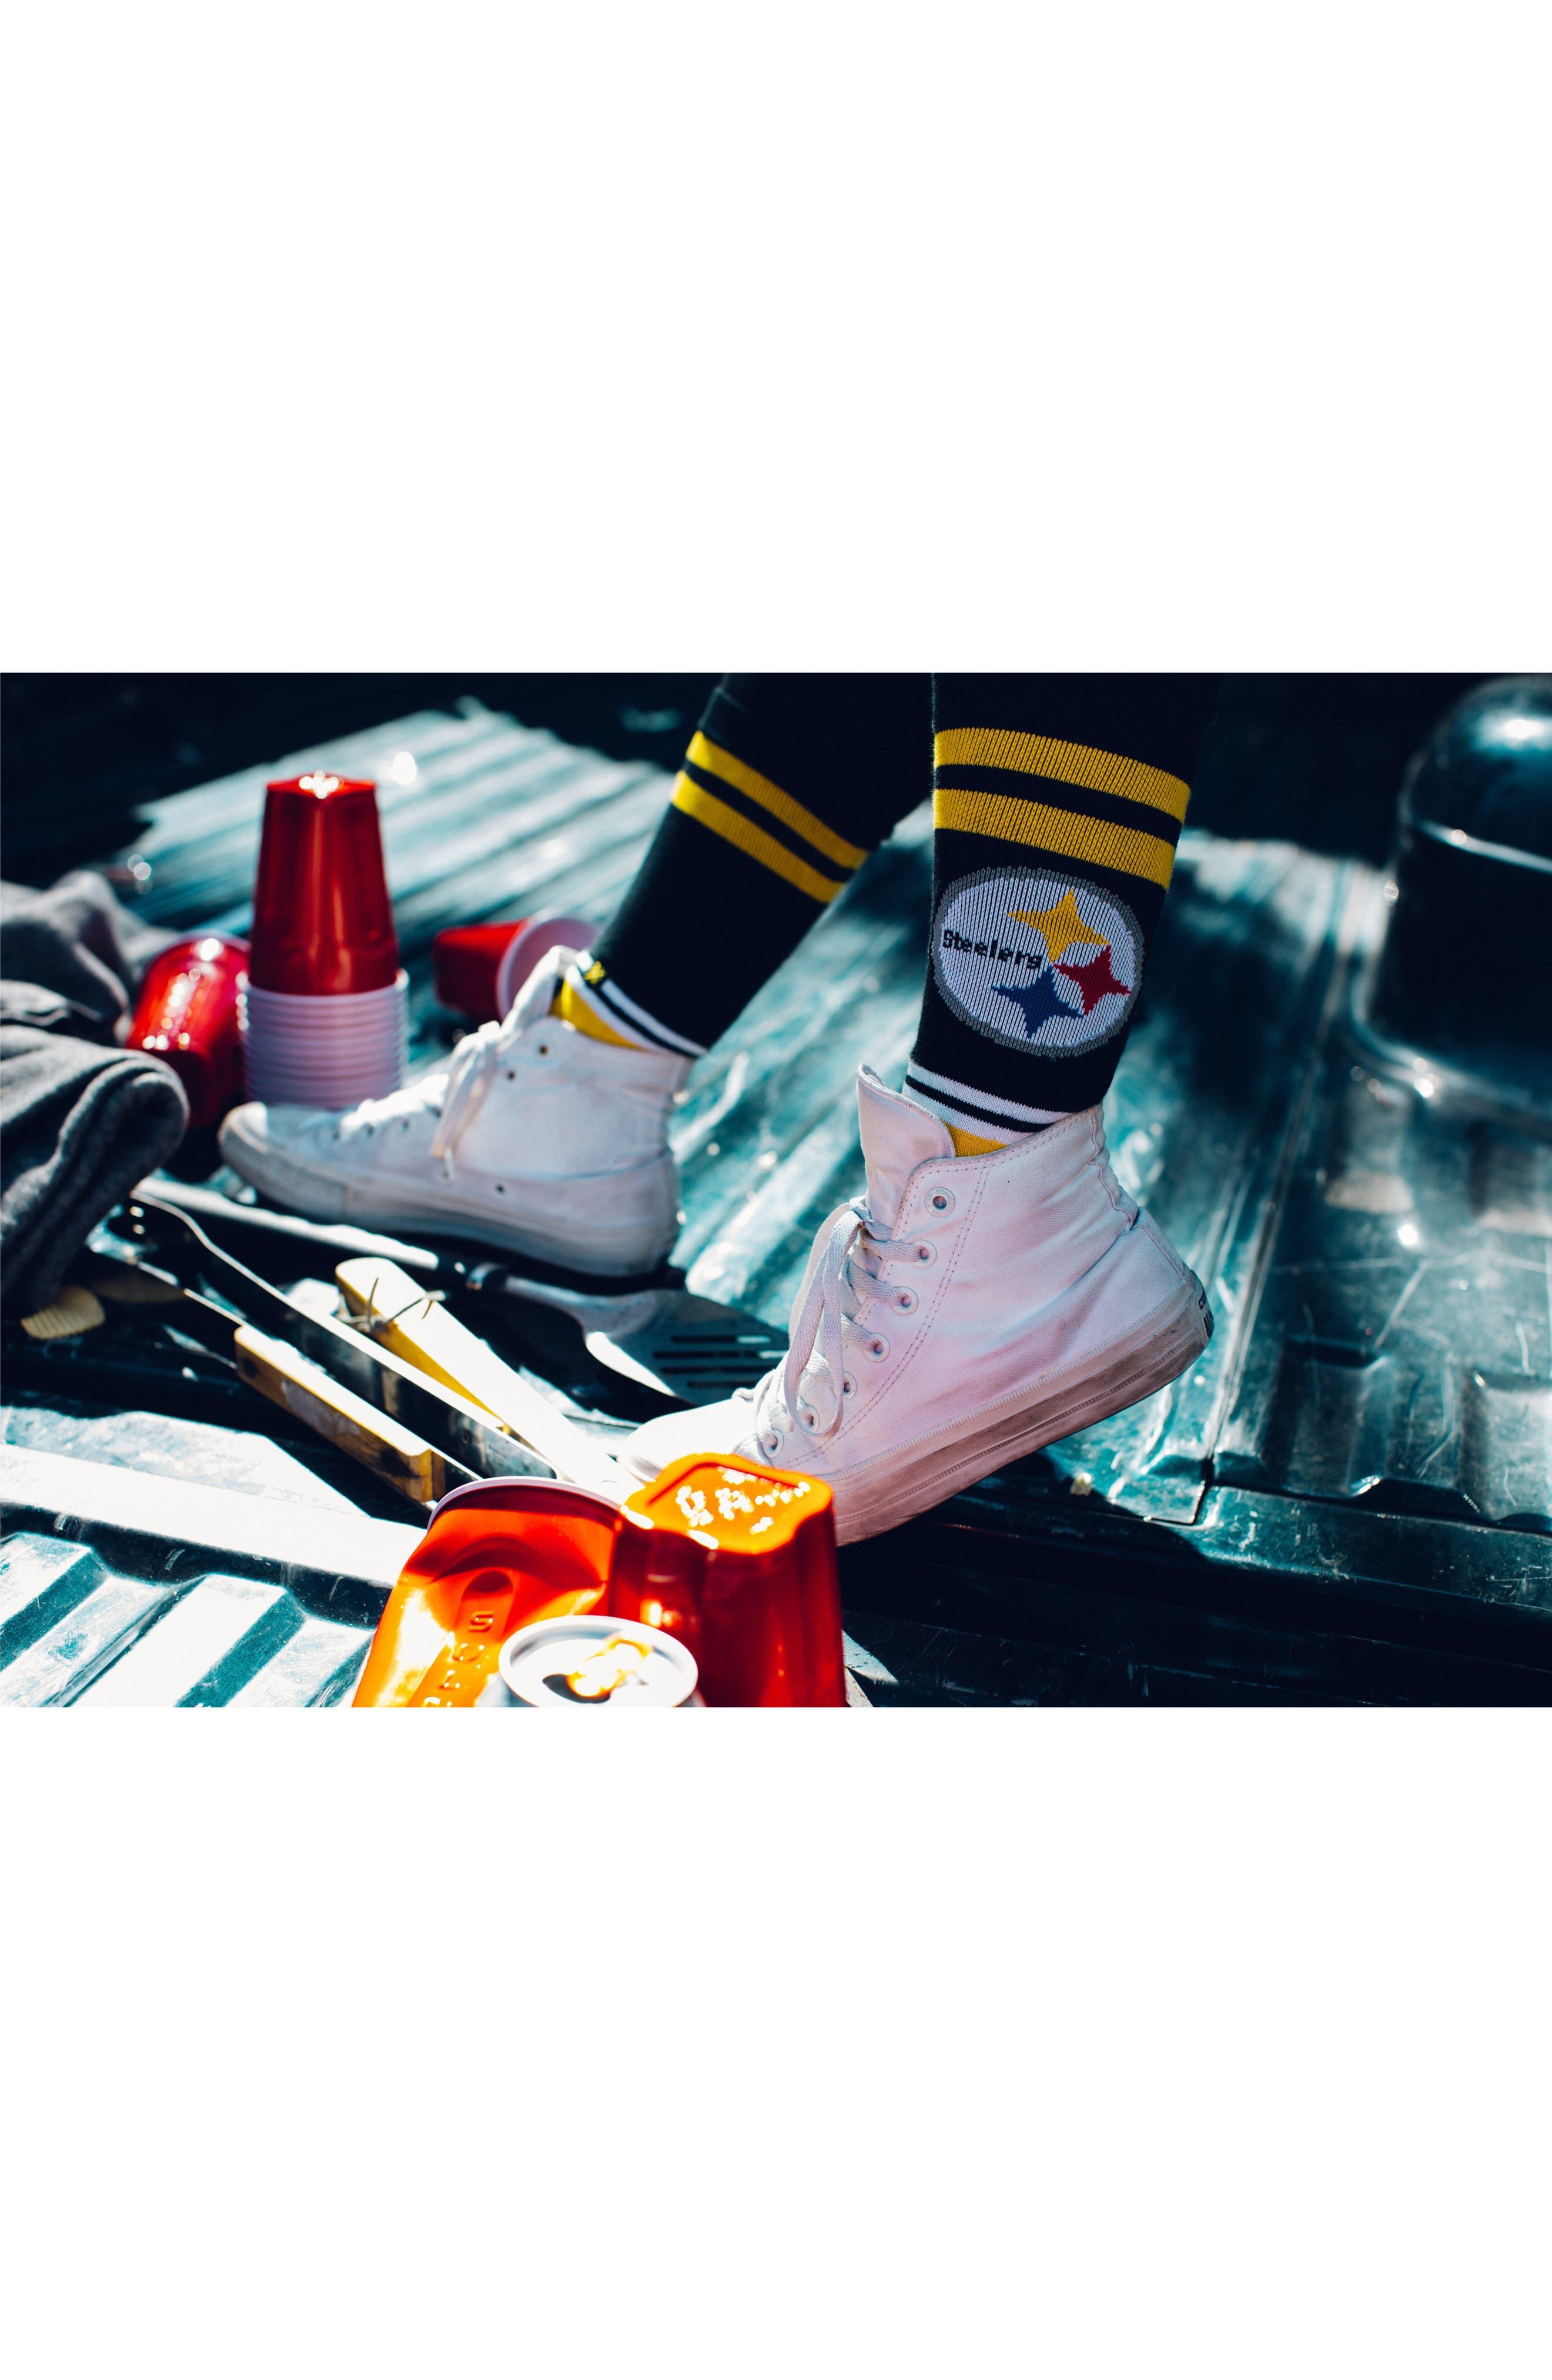 Pittsburgh Steelers - Fade Socks,                             Alternate thumbnail 5, color,                             YELLOW